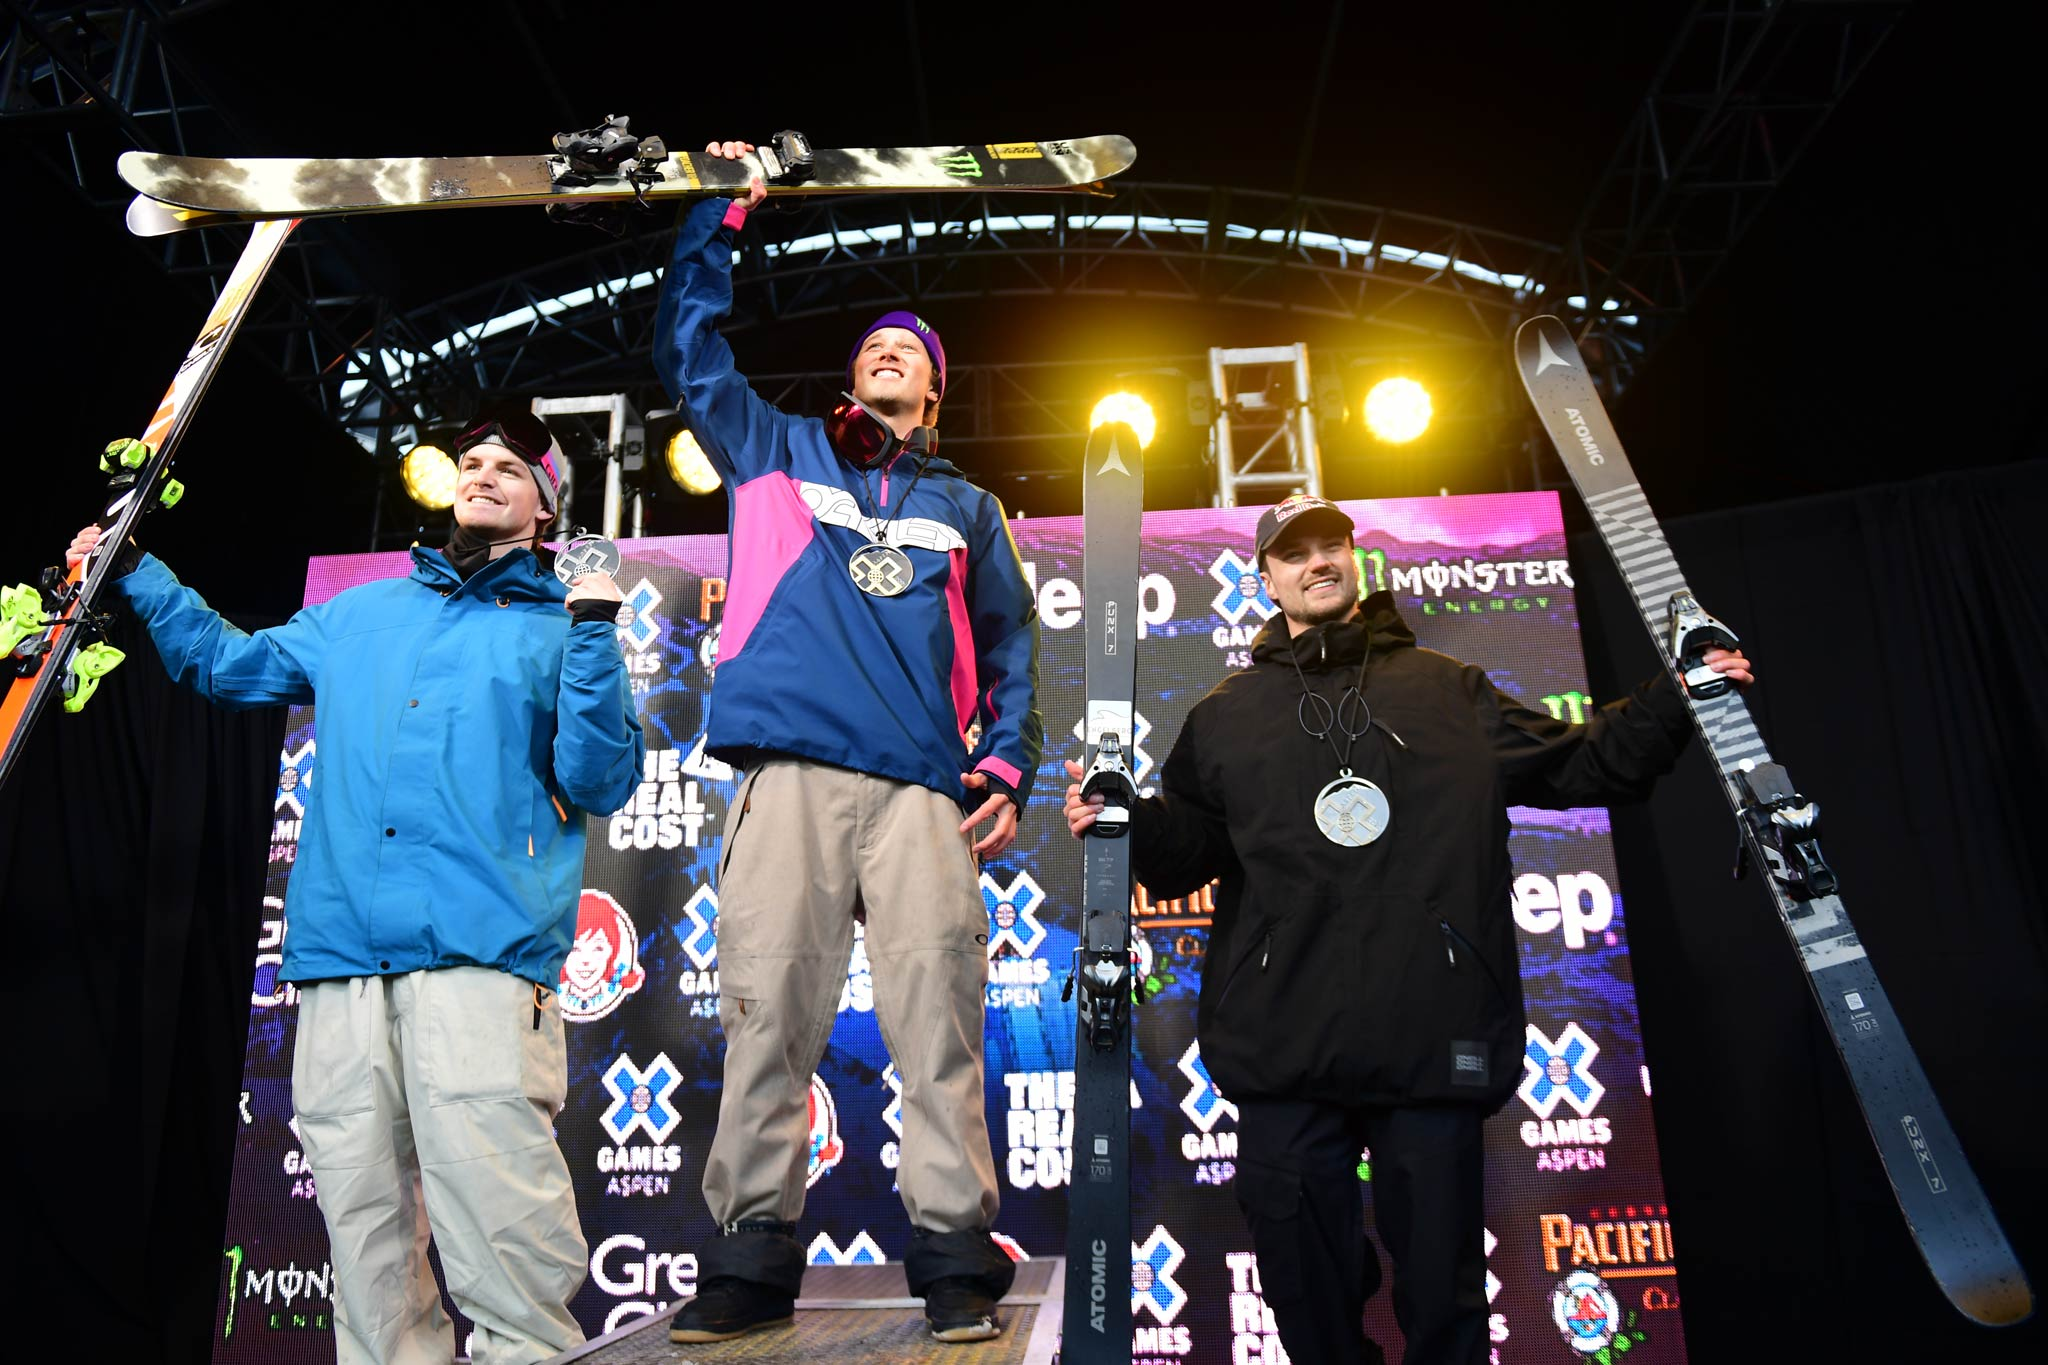 Die drei besten Slopestyler bei den X Games 2020: Evan McEachran (CAN), Colby Stevenson (USA), Fabian Bösch (SUI) - Foto: Eric Lars Bakke / ESPN Images